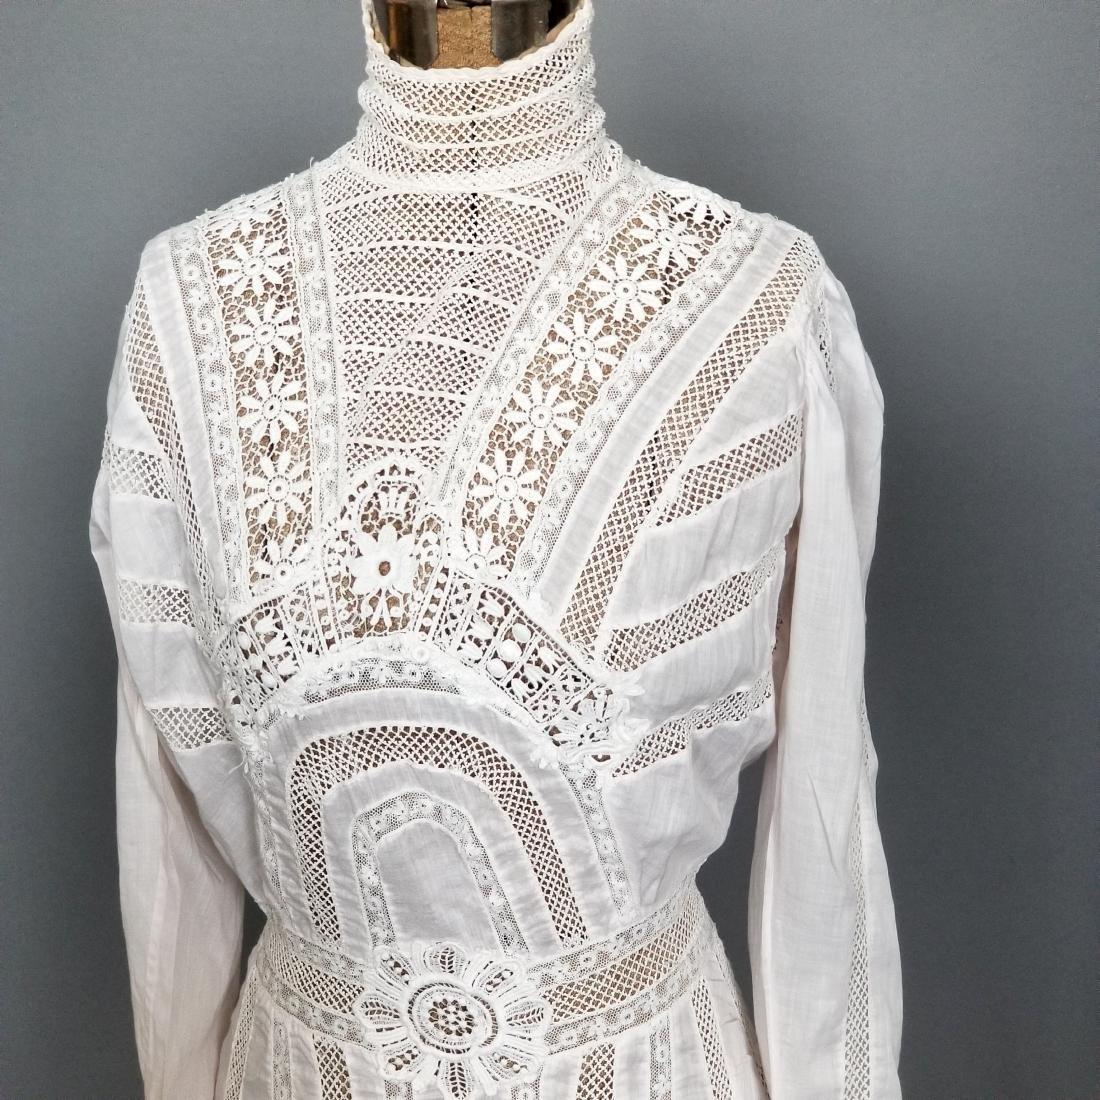 Pale Pink Lingerie Dress - 2